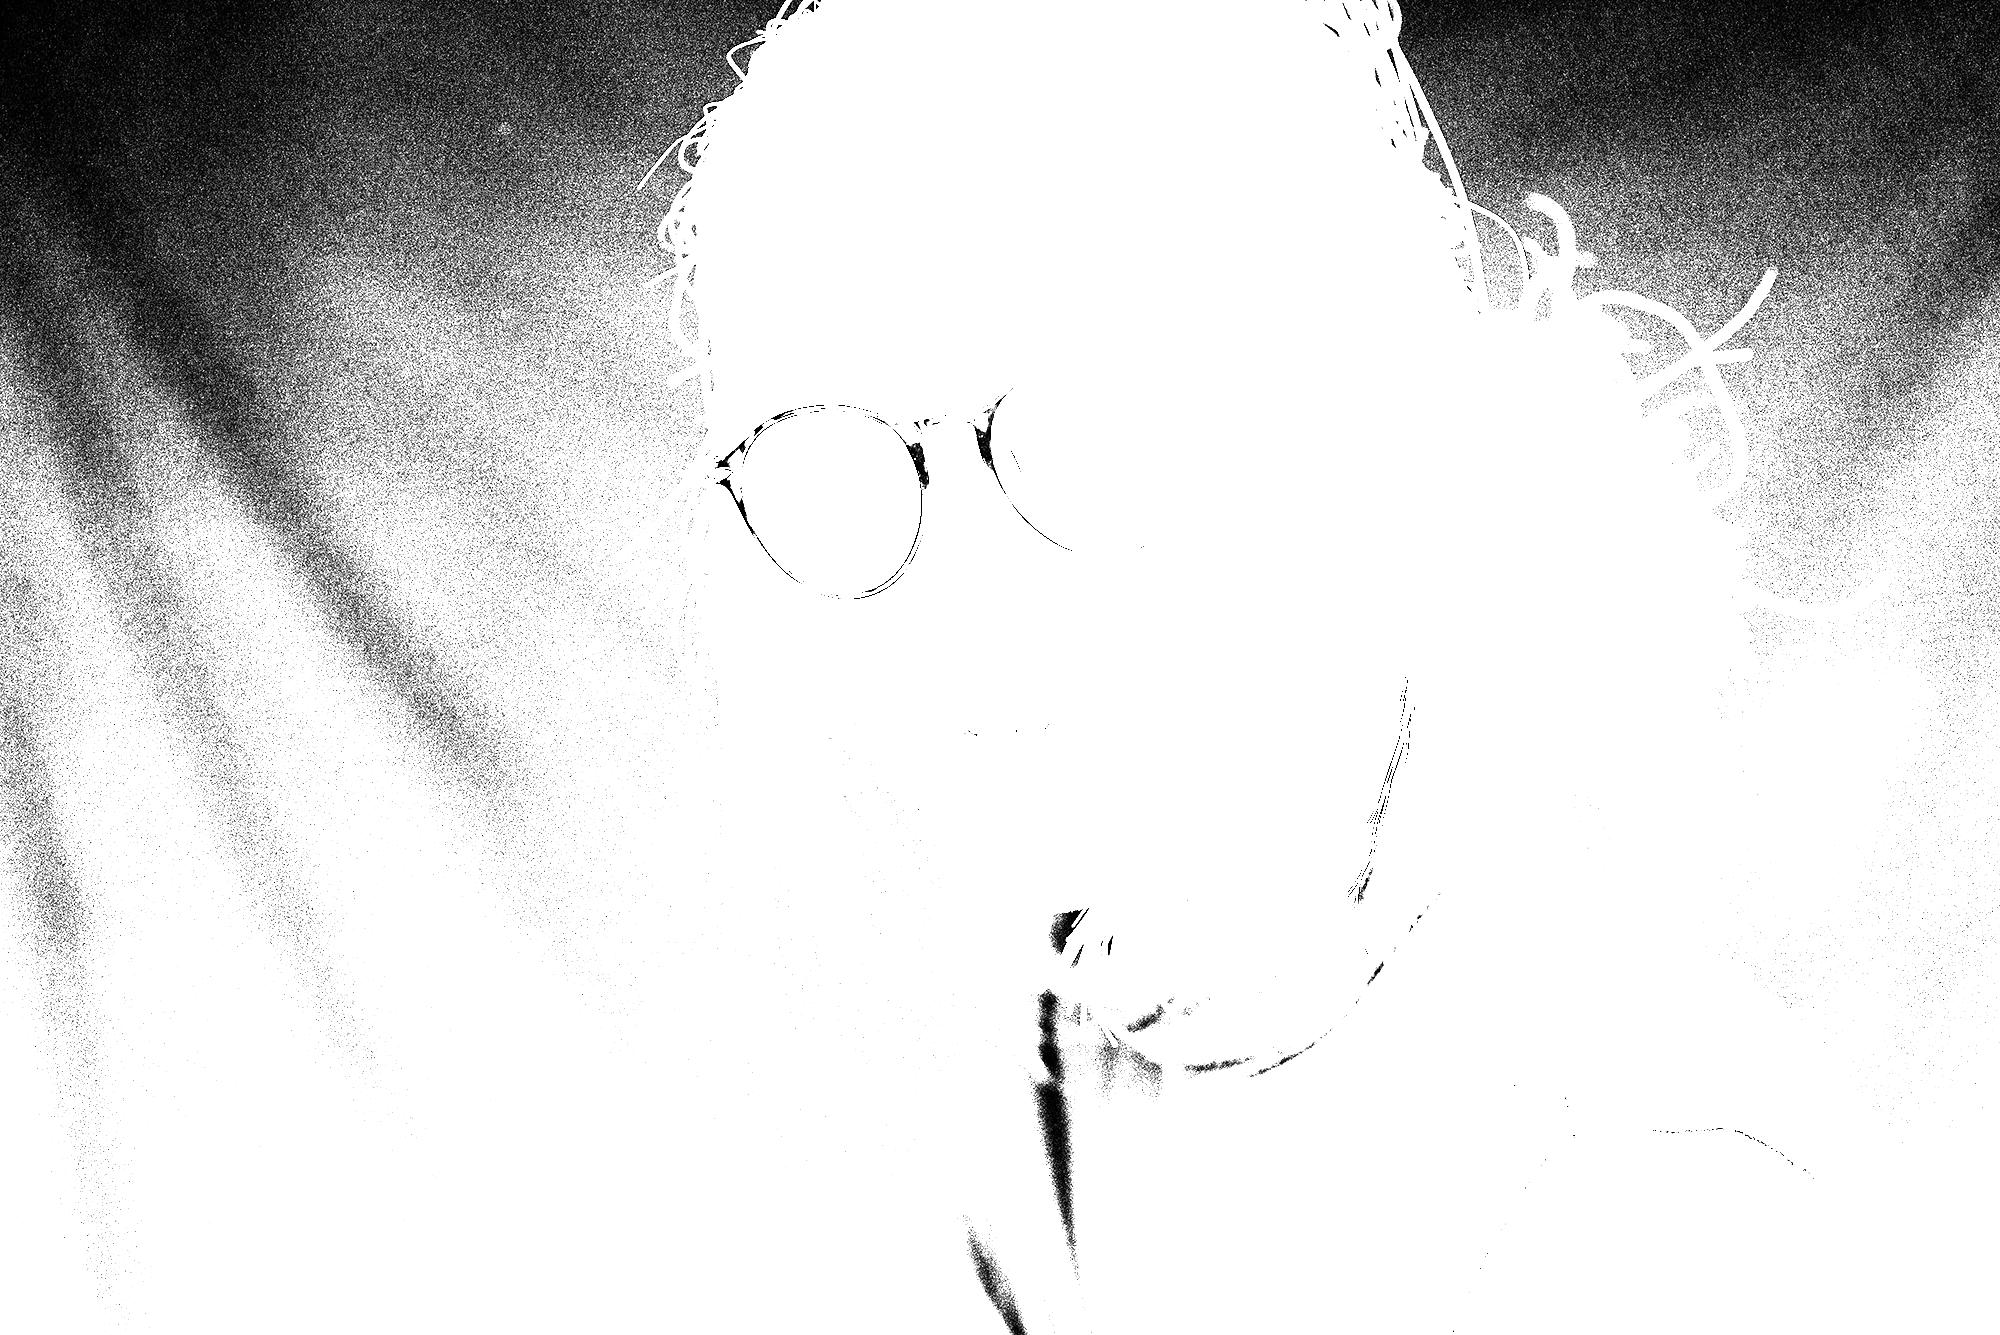 20161218-DSC_9428.png